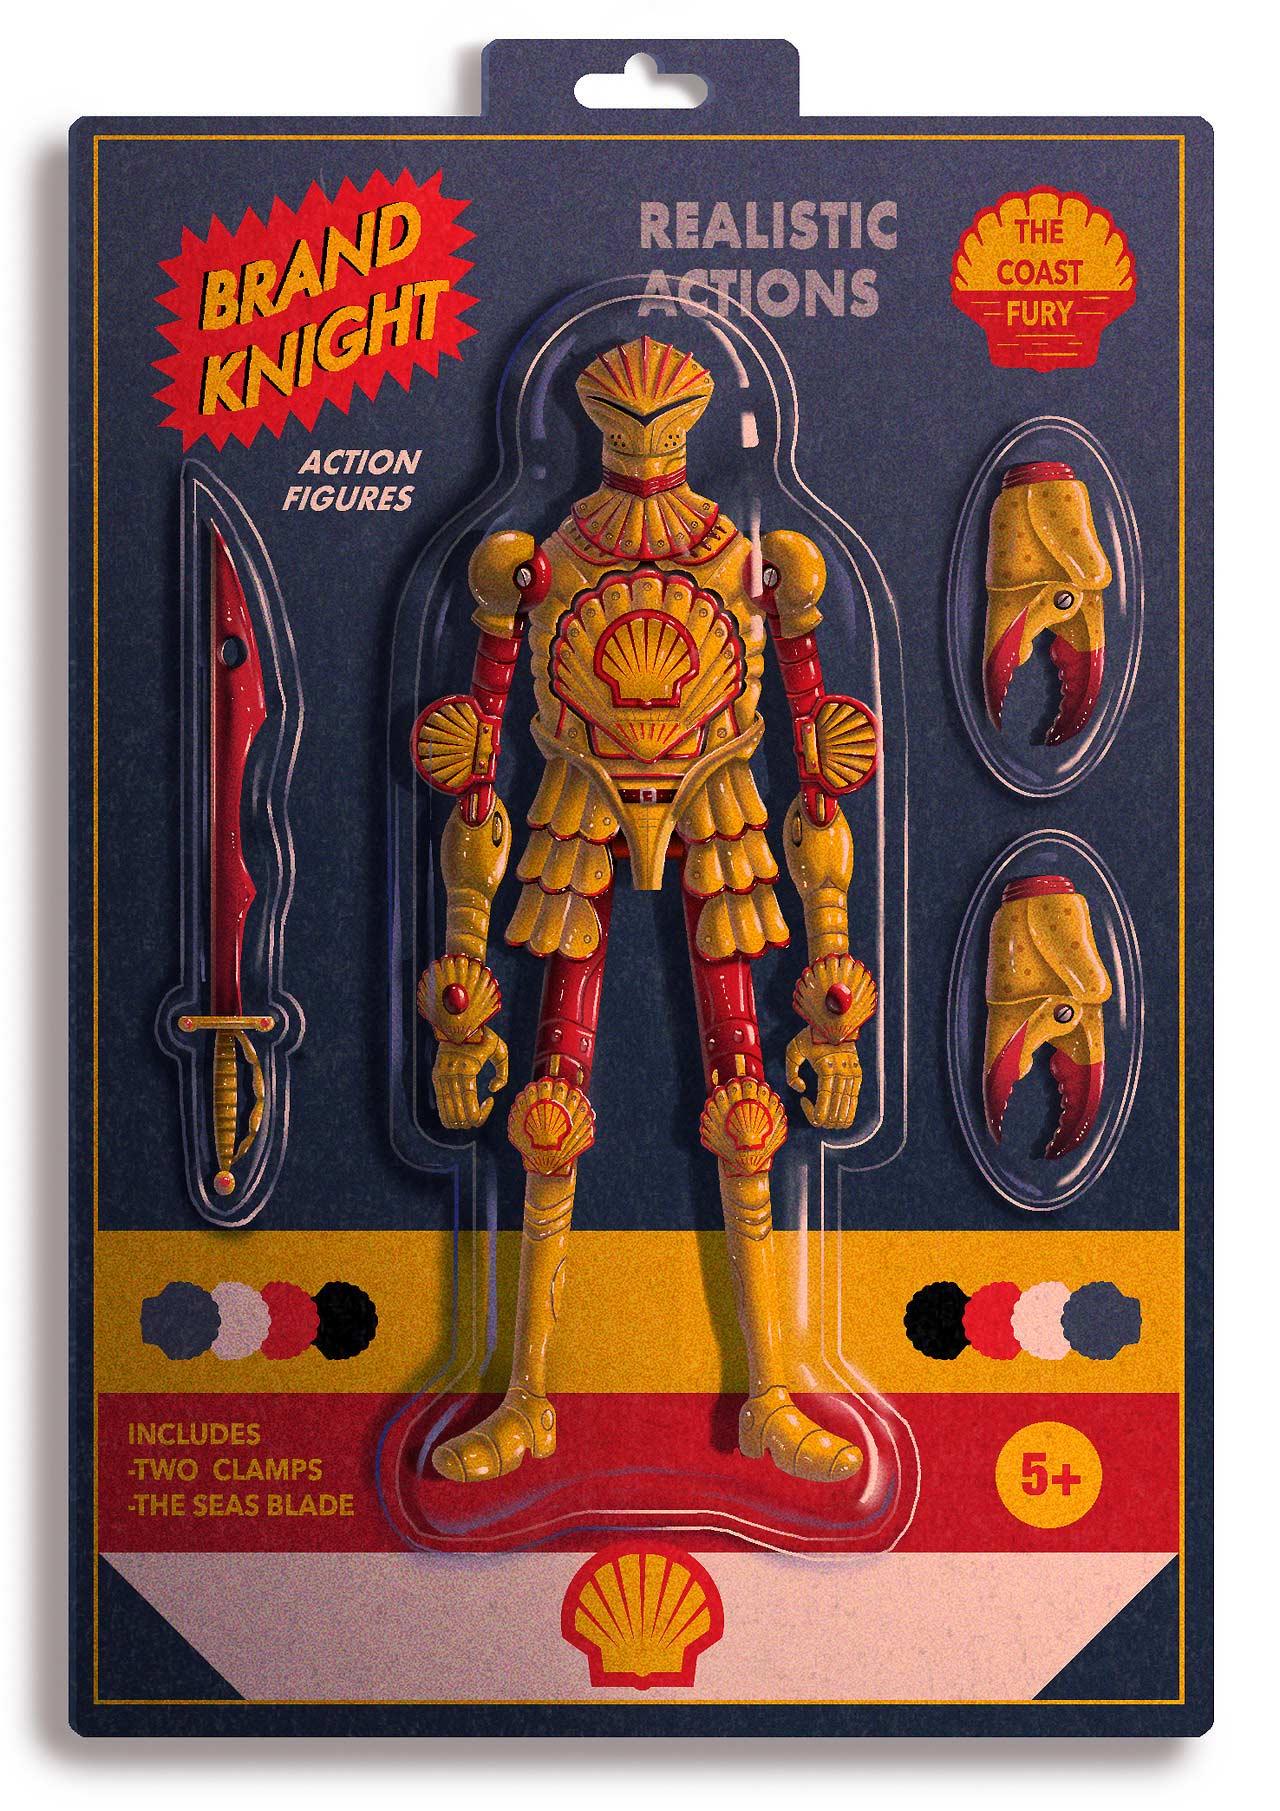 Brand Knights brand-knights_09